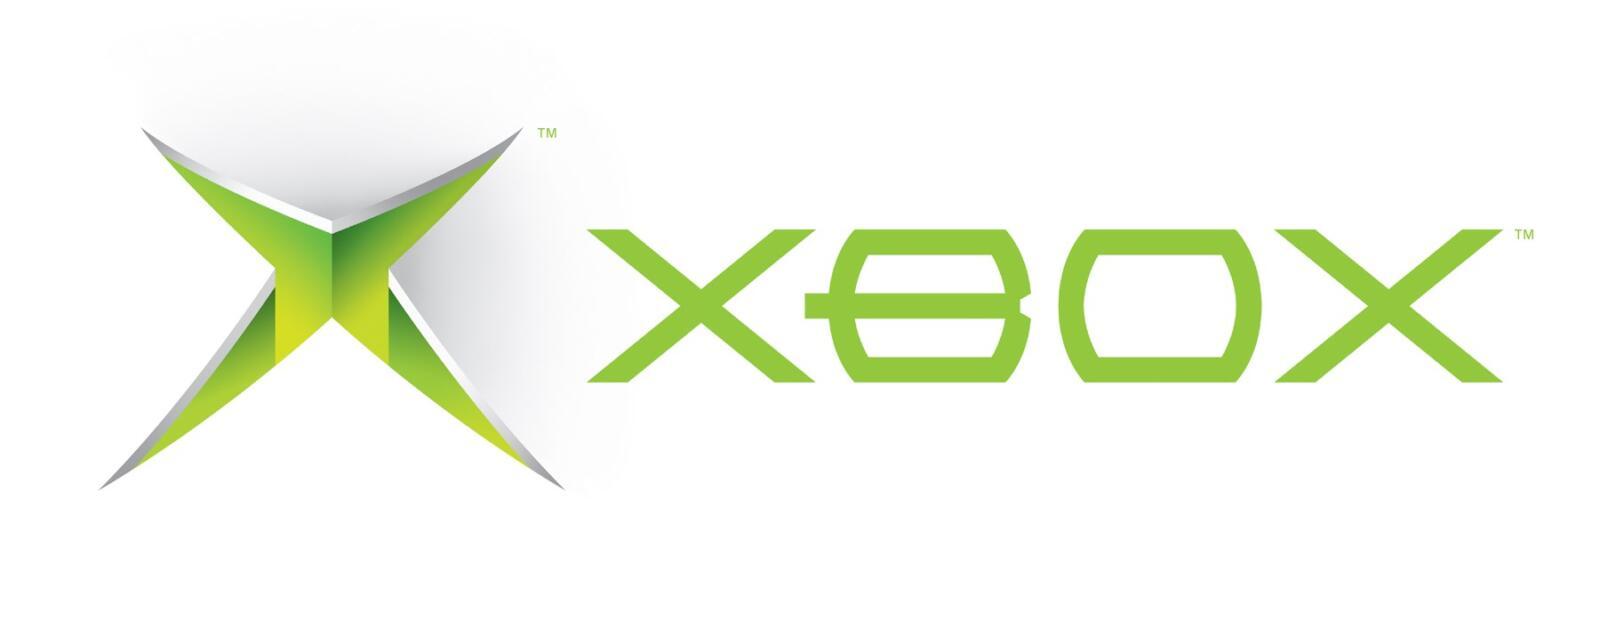 Infinity microsoft xbox